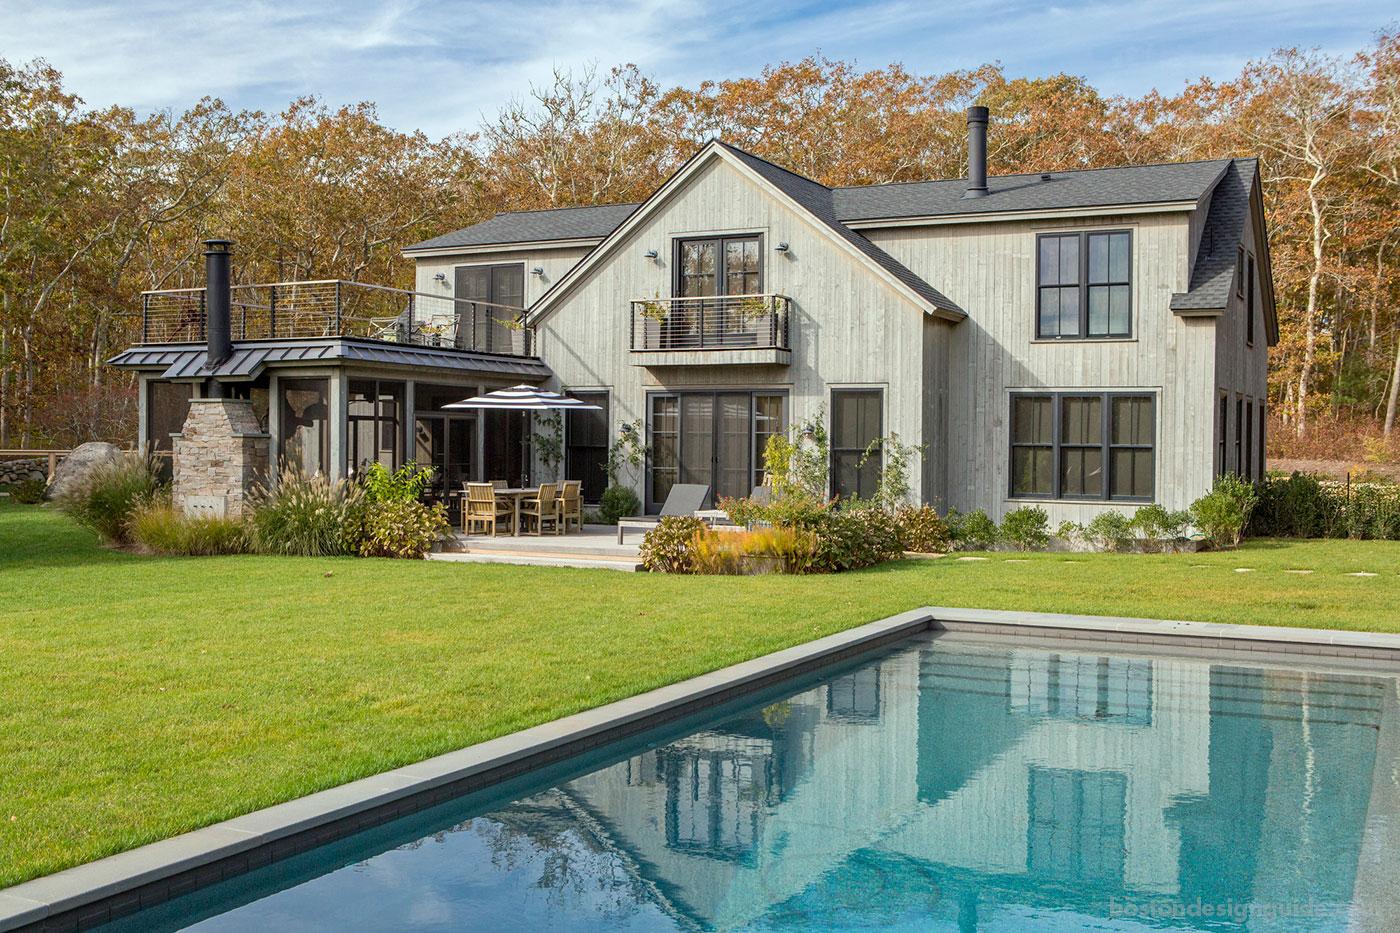 Yankee Barn Home on Martha's Vineyard